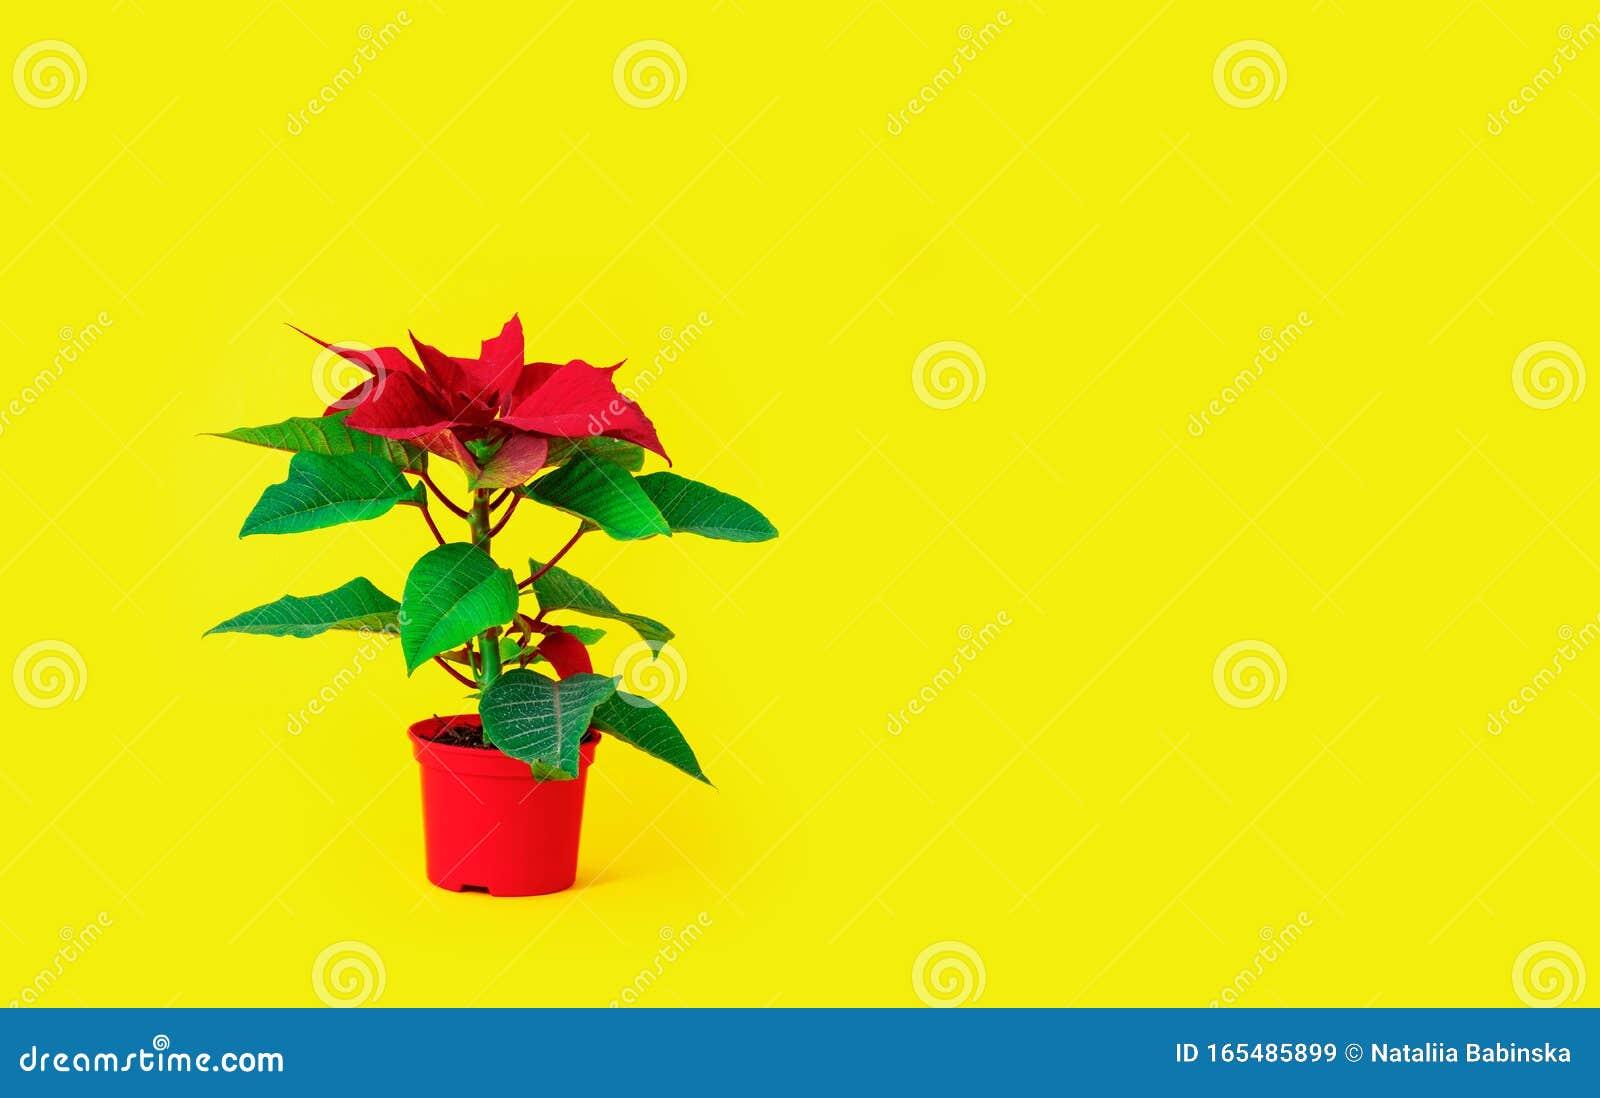 Red Poinsettia Yellow Background Green Leaves Vase Pot Bush Plant Stock Image Image Of Buying Fantasy 165485899